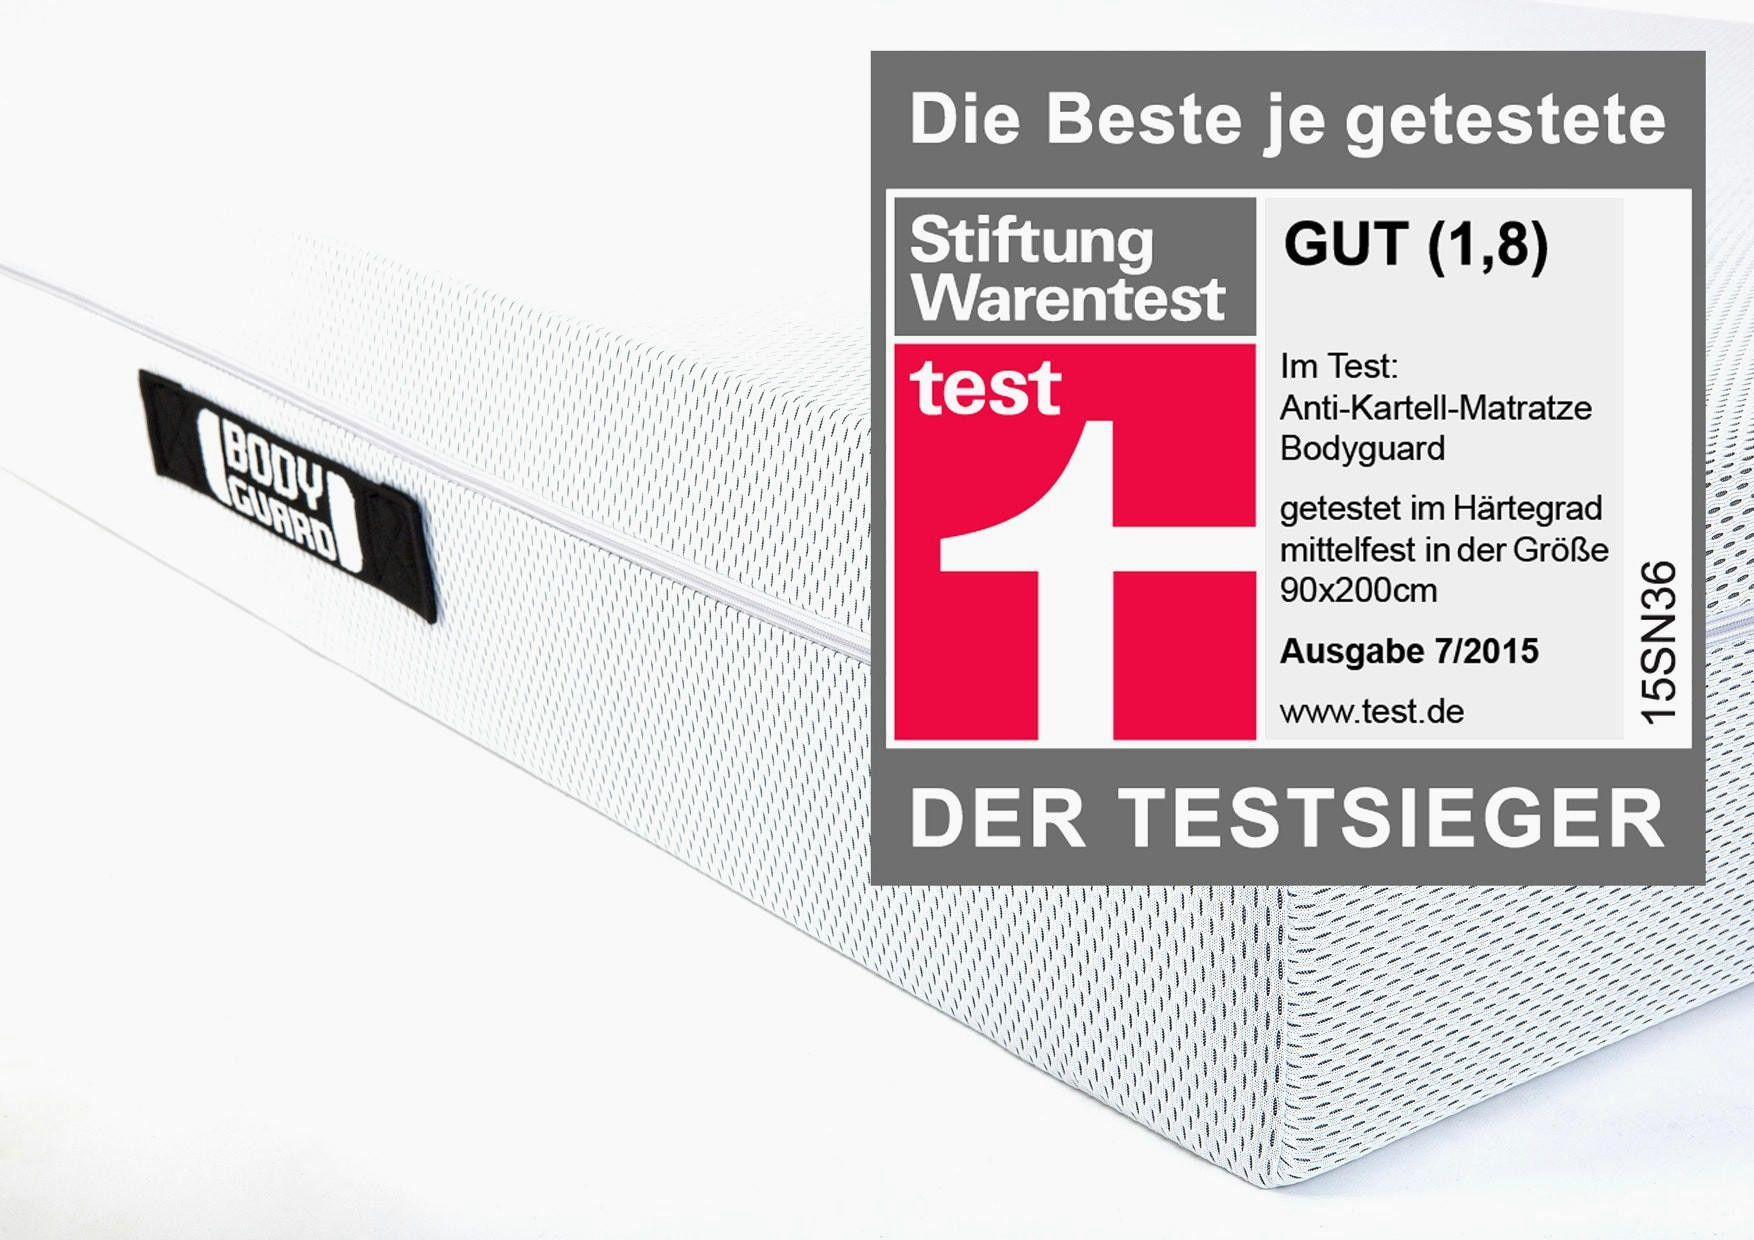 Warentest Matratzen Best Of Matratzen Testsieger 2018 Einzigartig Stiftung Warentest Di 2020